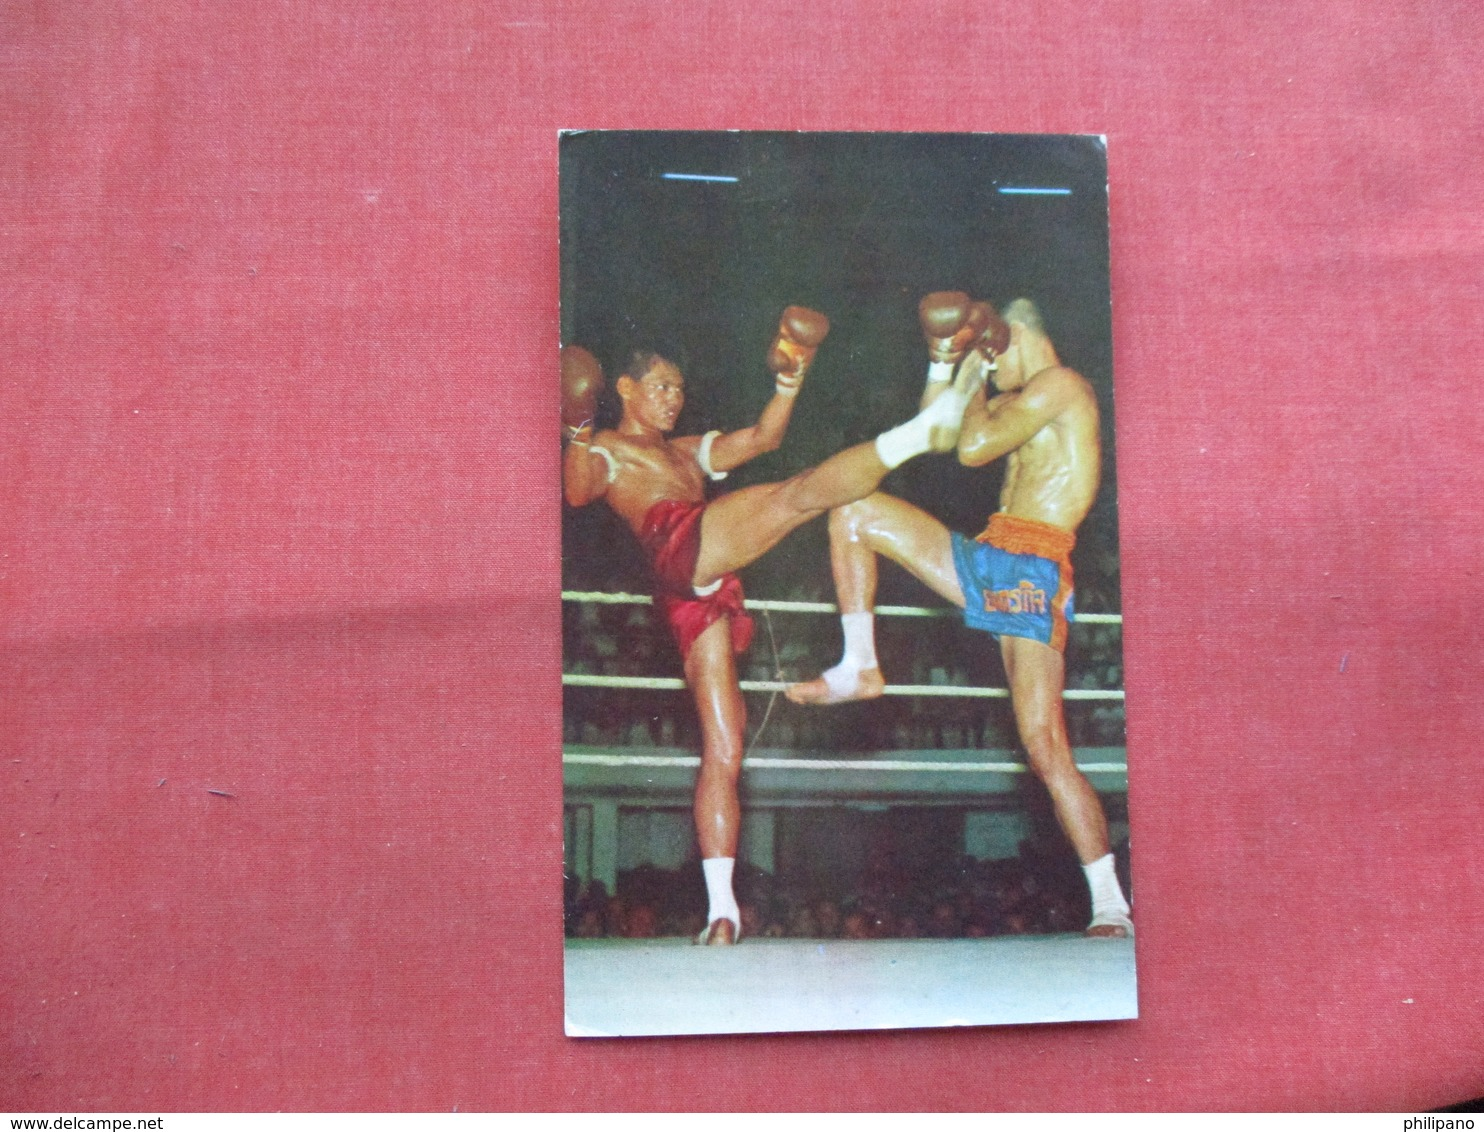 Thai Styled Boxing  Bangkok Thailand     -ref    3572 - Boxing